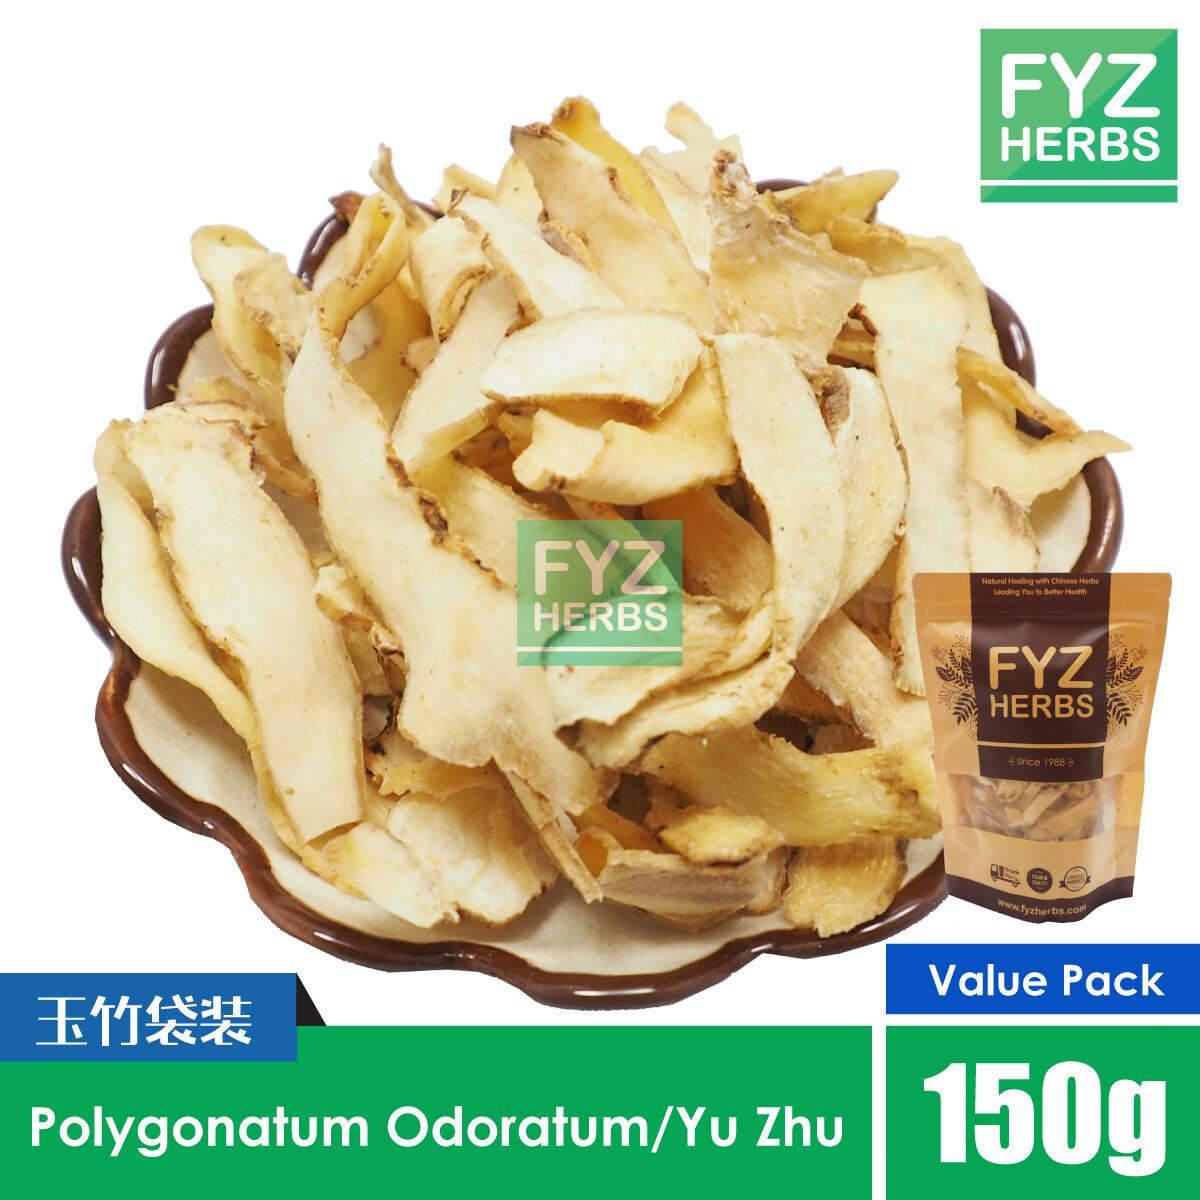 FYZ Herbs Polygonatum Odoratum Yu Zhu 150g [Value Pack] 玉竹袋装 150g